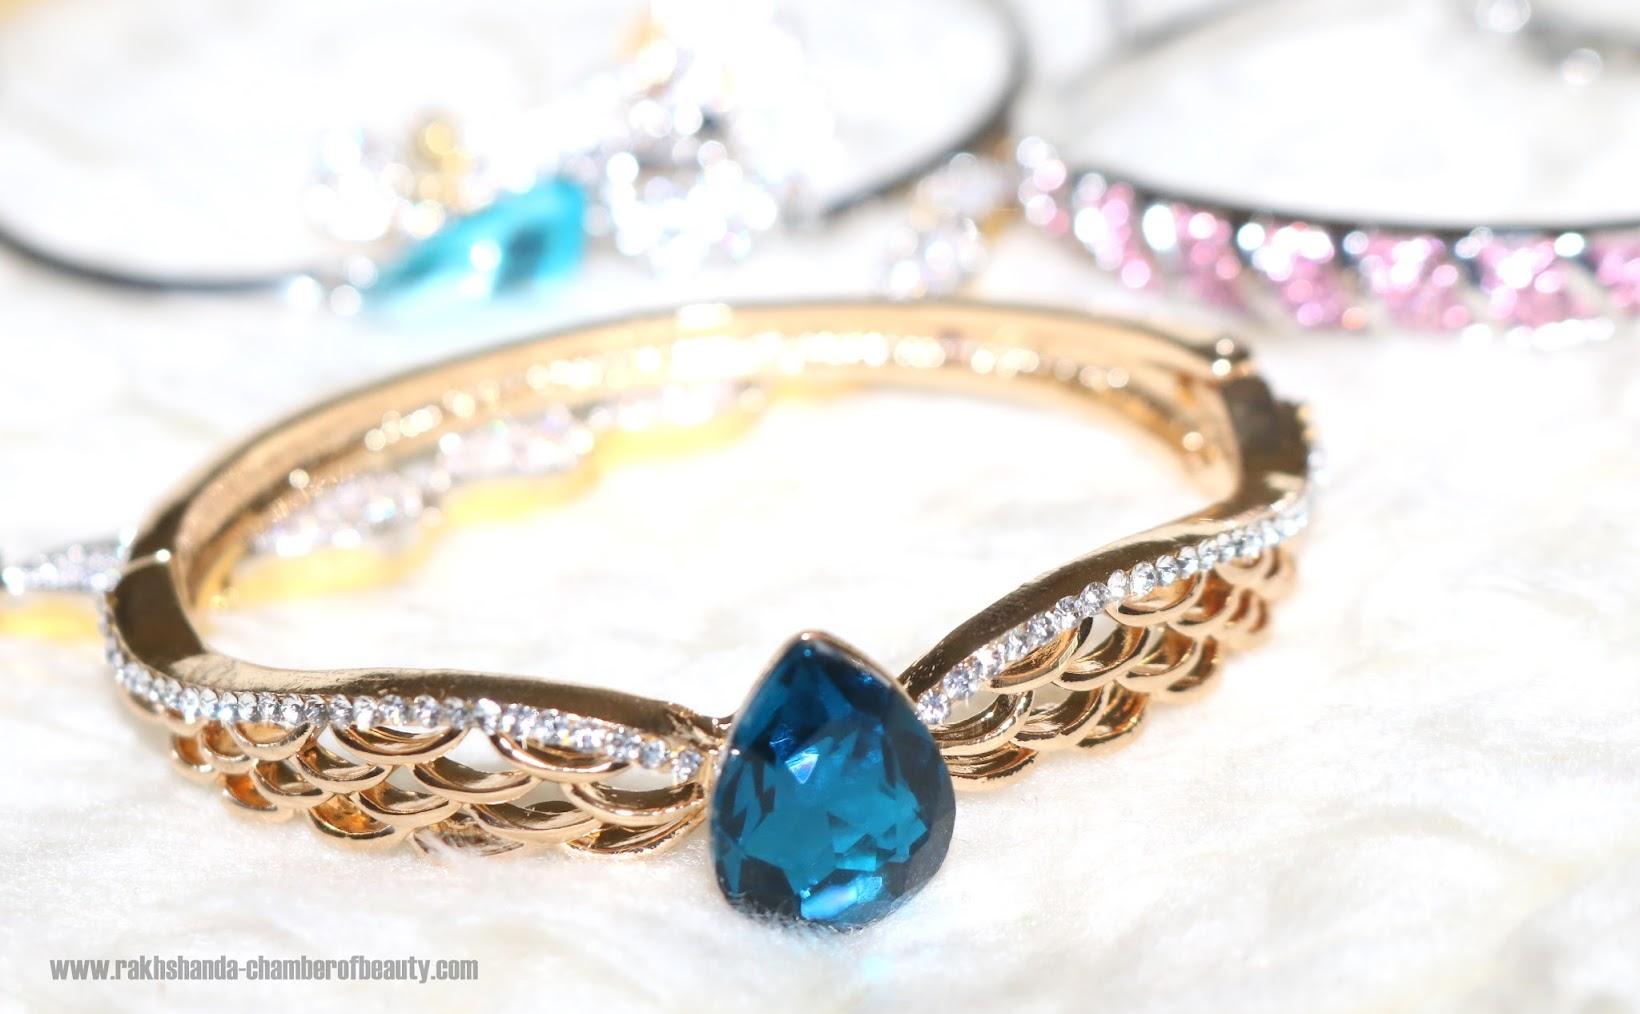 YouBella Jewelry haul, Indian fashion blogger, Chamber of Beauty